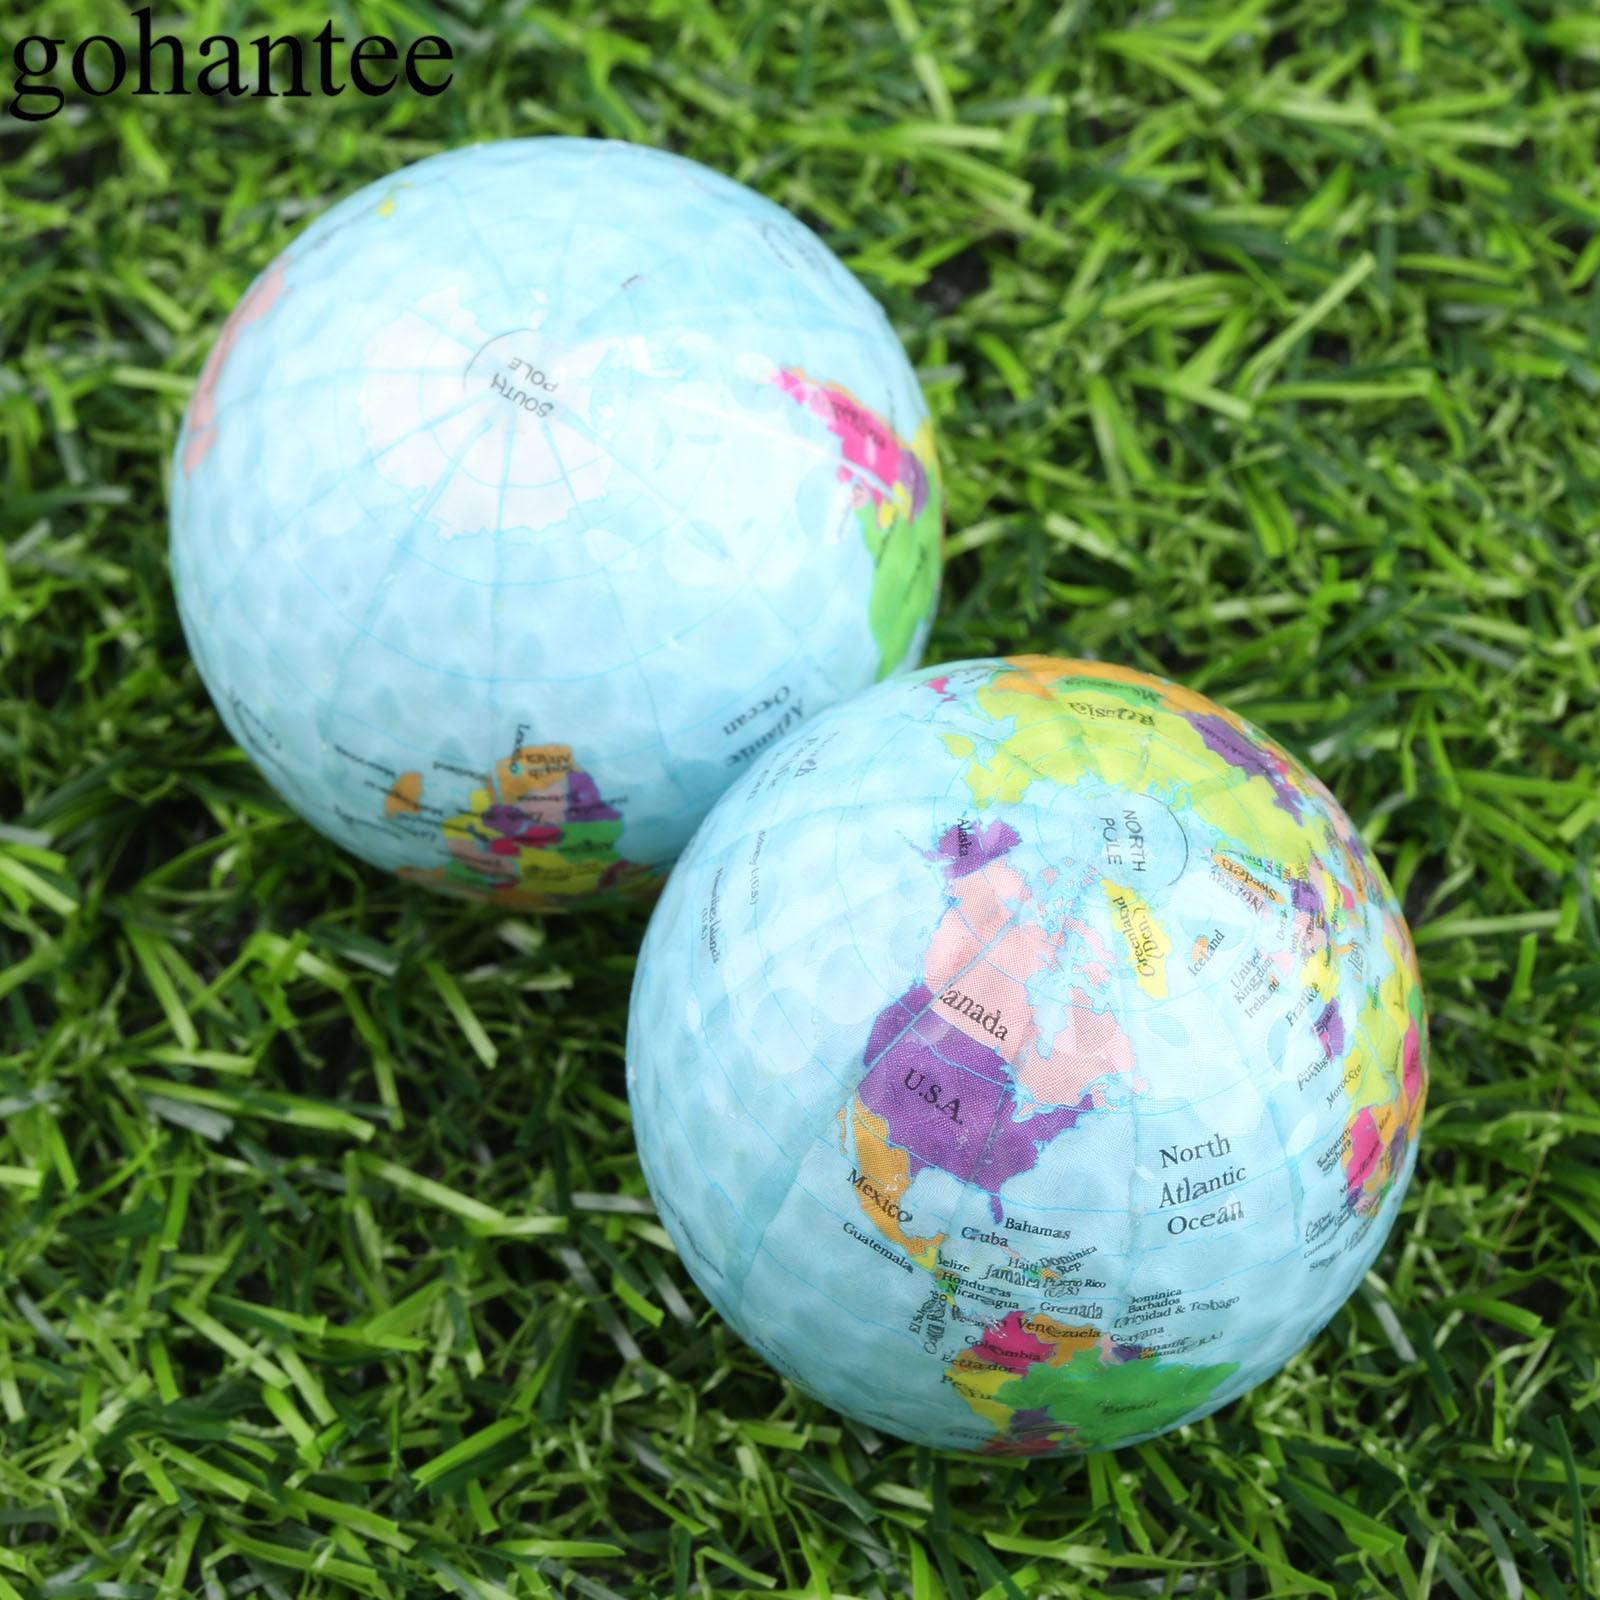 bolas de golfe surlyn prática treinamento bolas